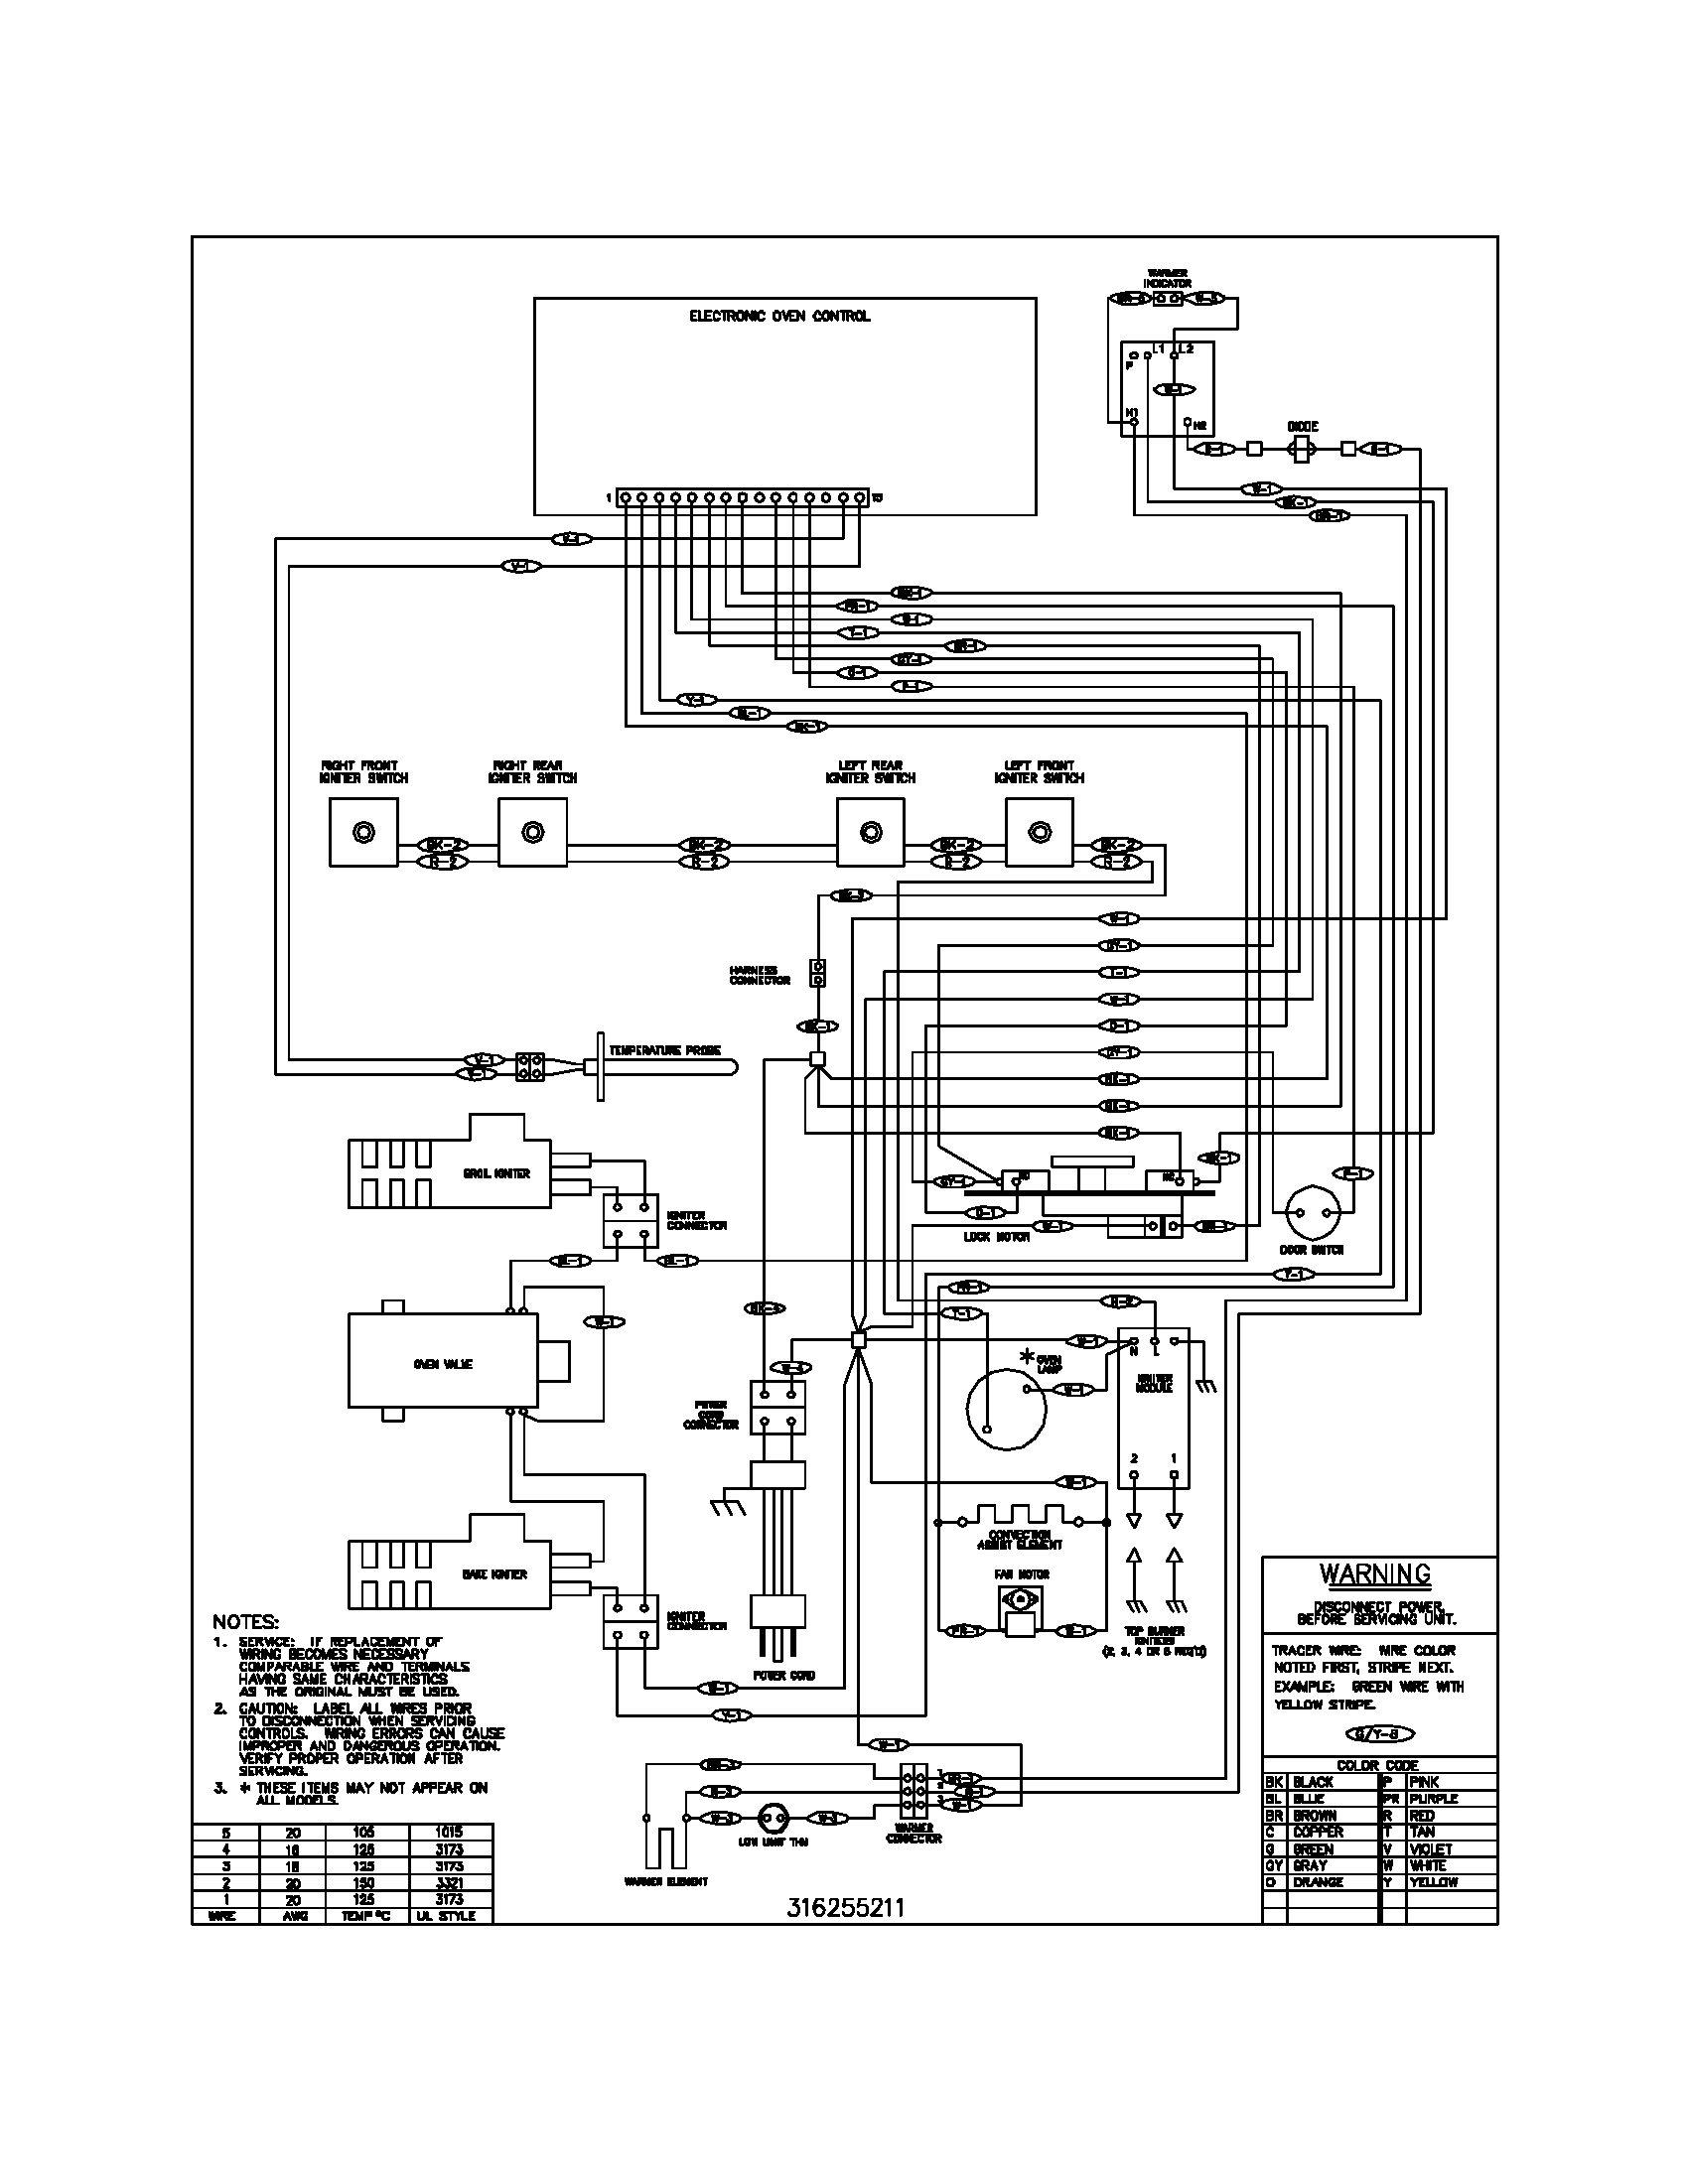 MF_8932] Wiring Diagram Of Freezer Free DiagramTaliz Menur Recoveryedb Librar Wiring 101